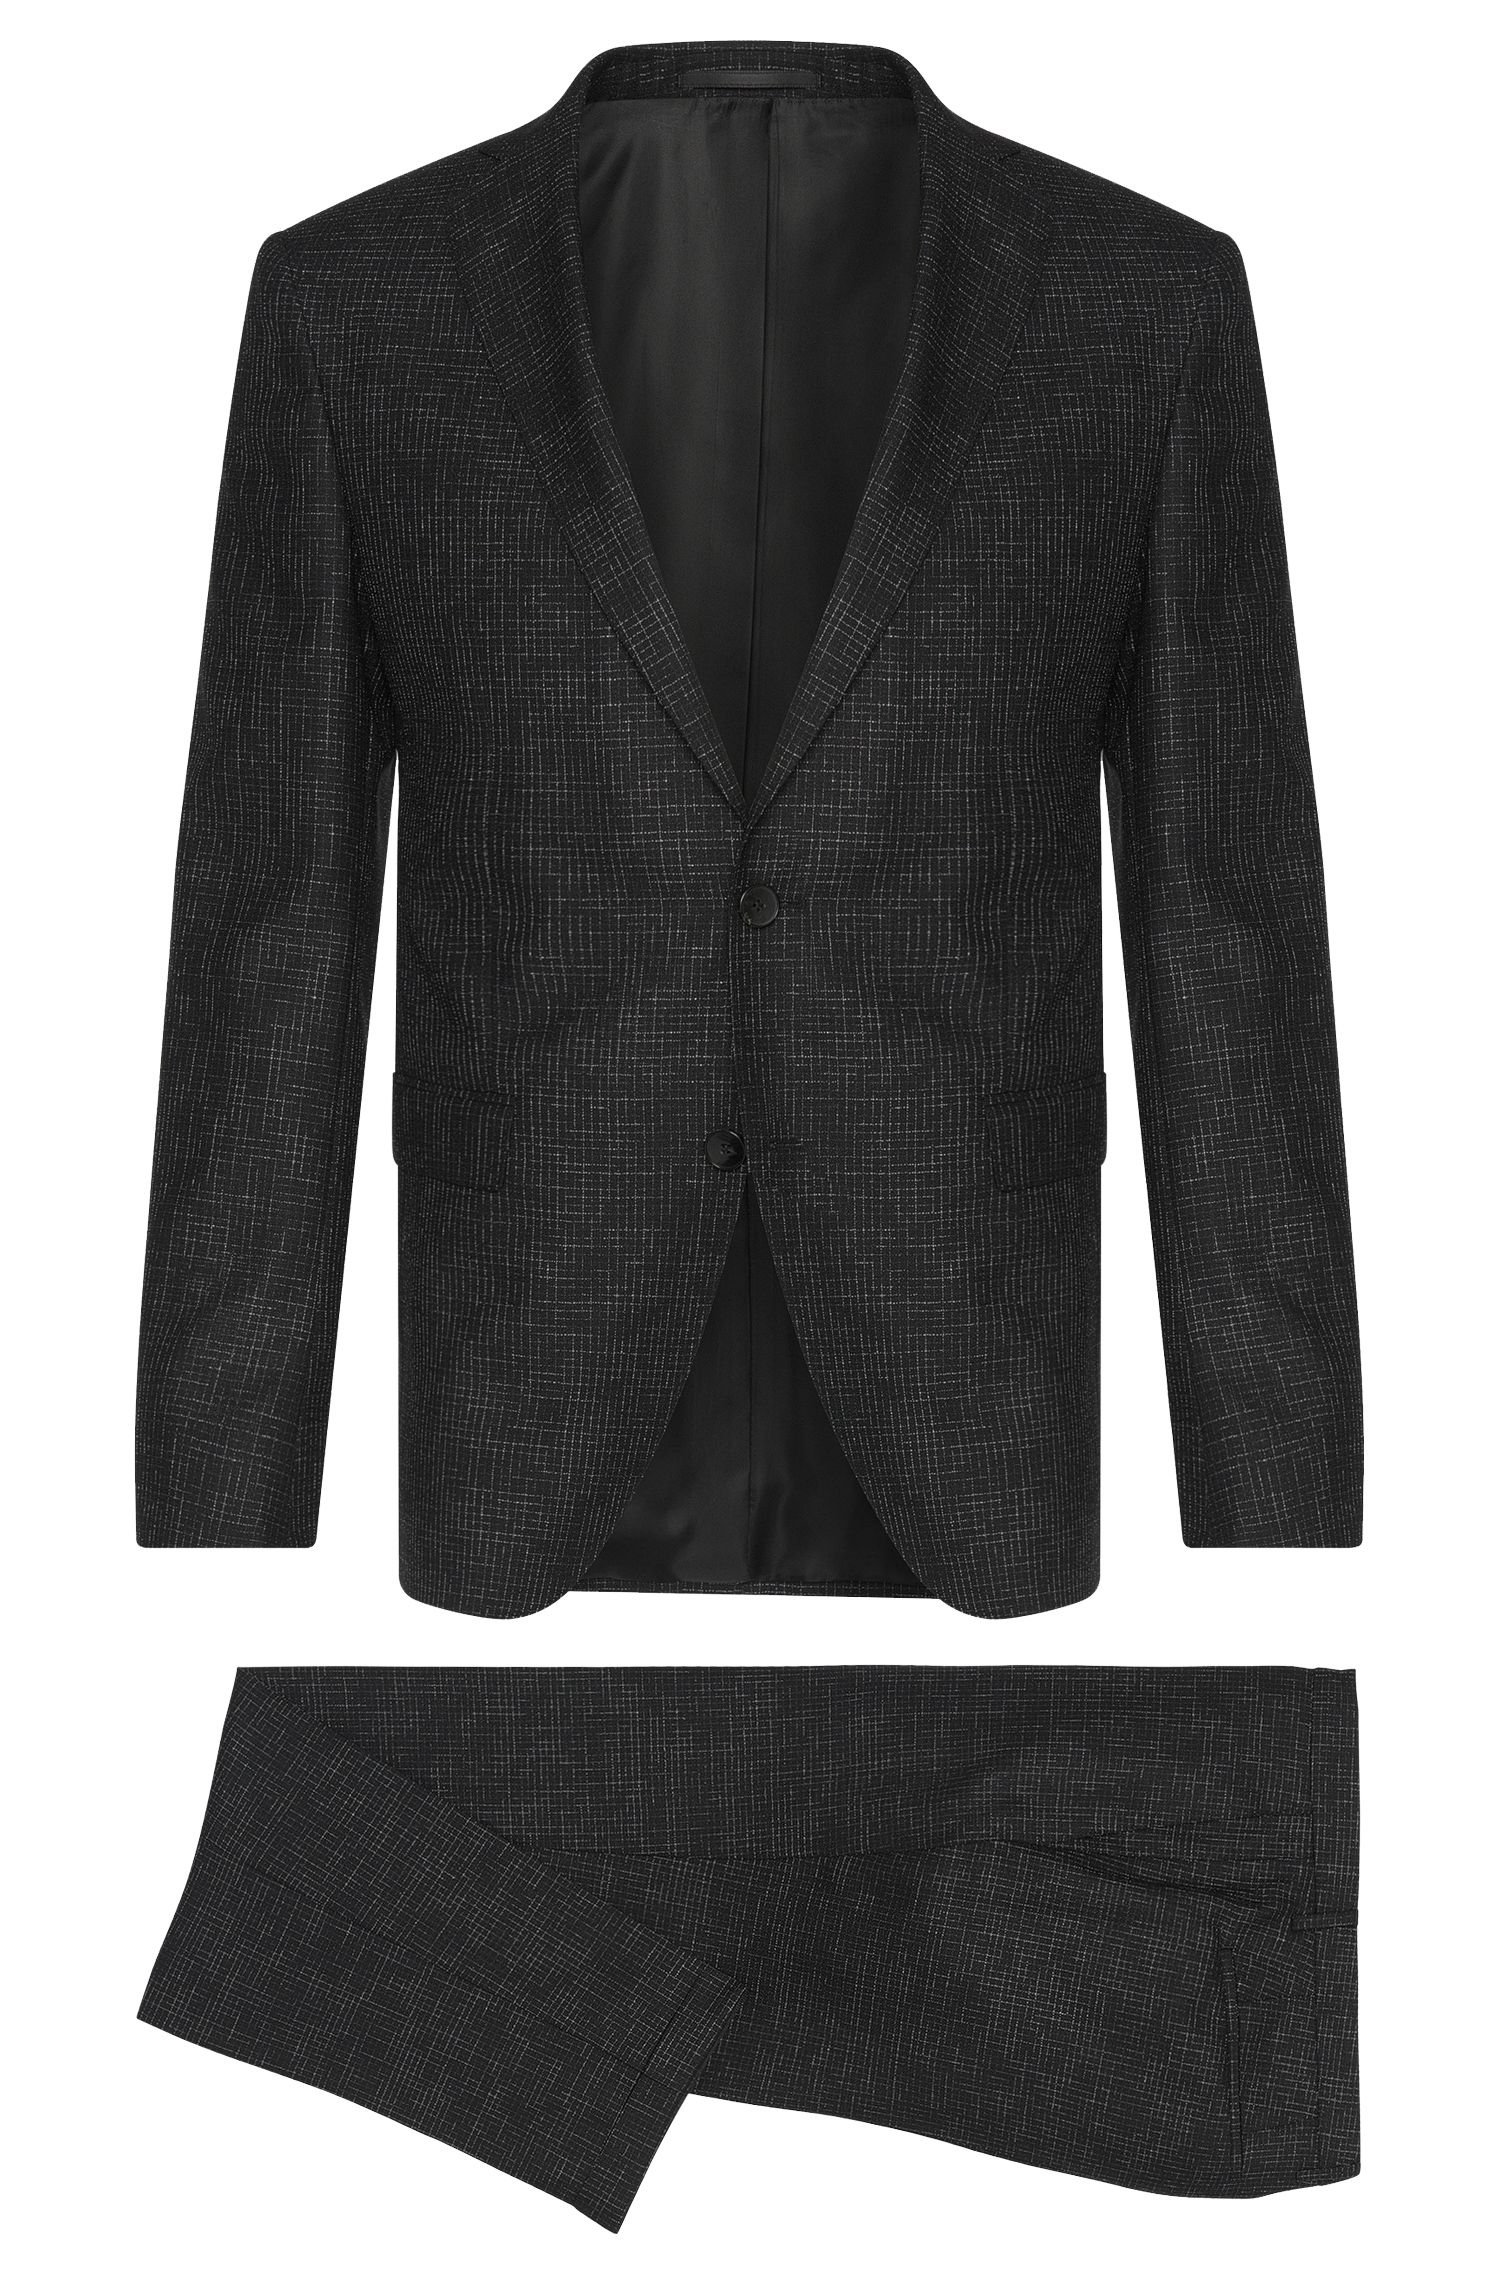 Metallic Super 100 Italian Virgin Wool Suit, Extra-Slim Fit | Reyno/Wave